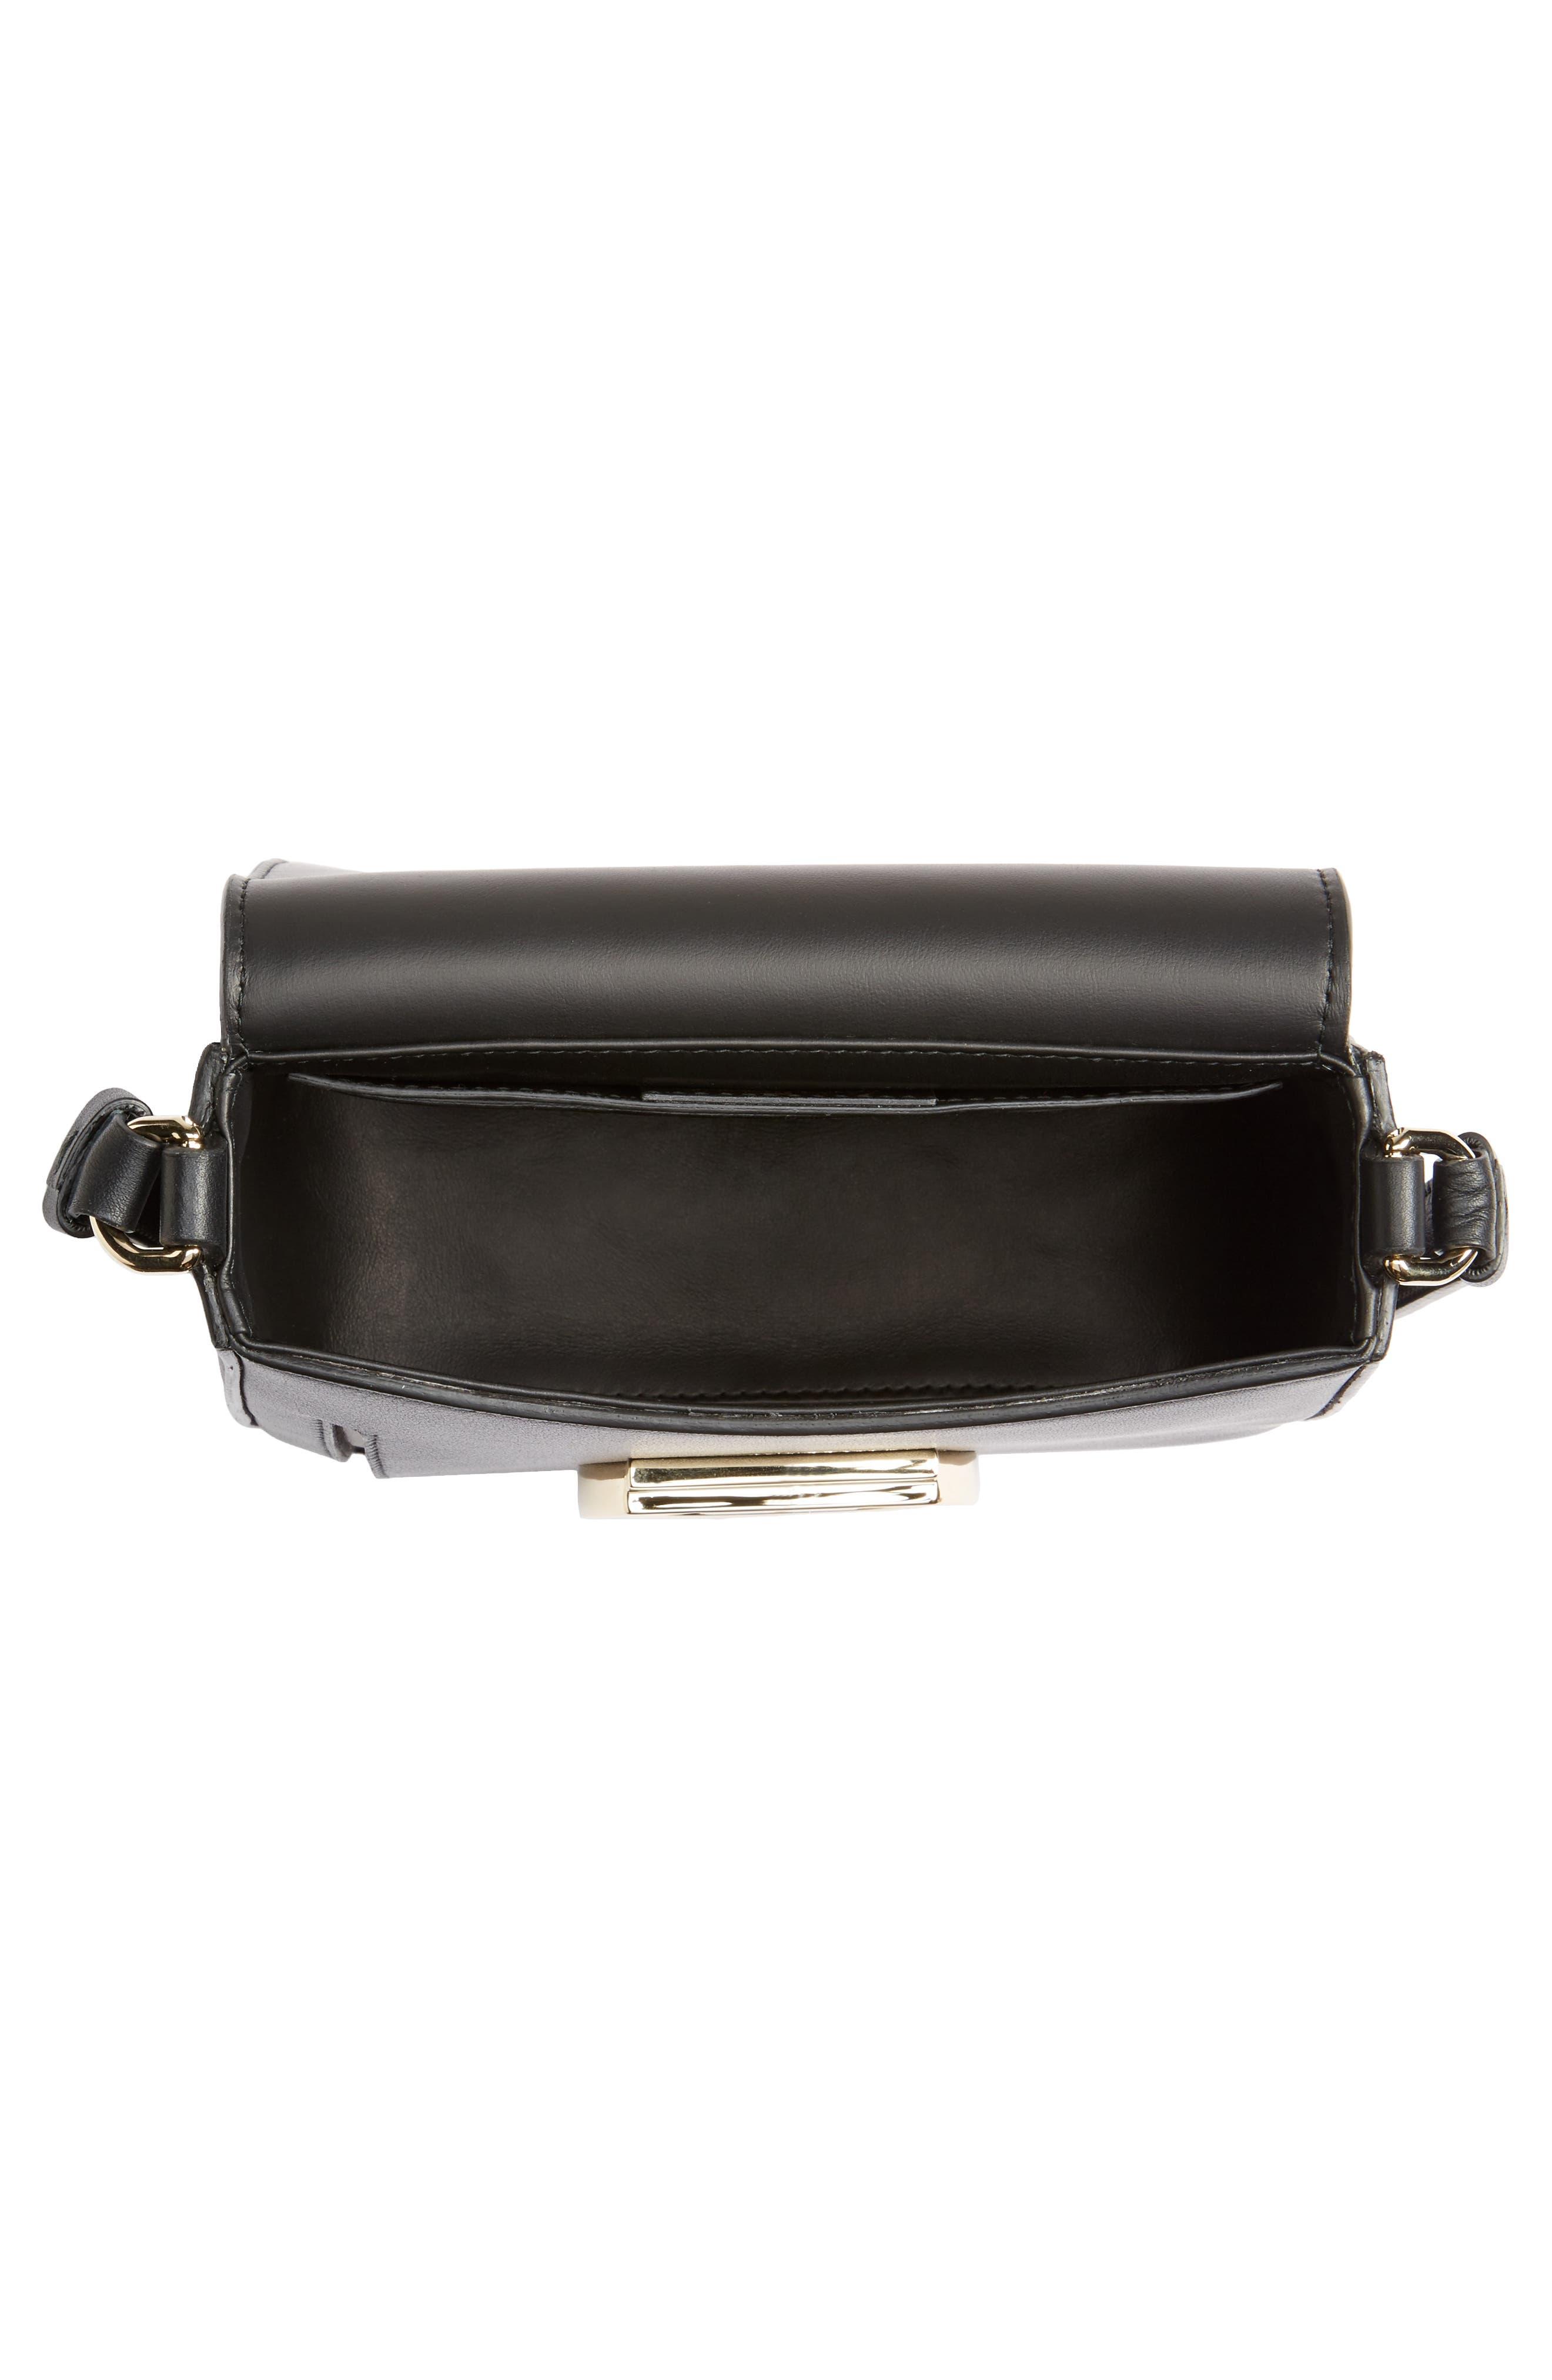 Gancio Lock Leather Crossbody Bag,                             Alternate thumbnail 4, color,                             Nero